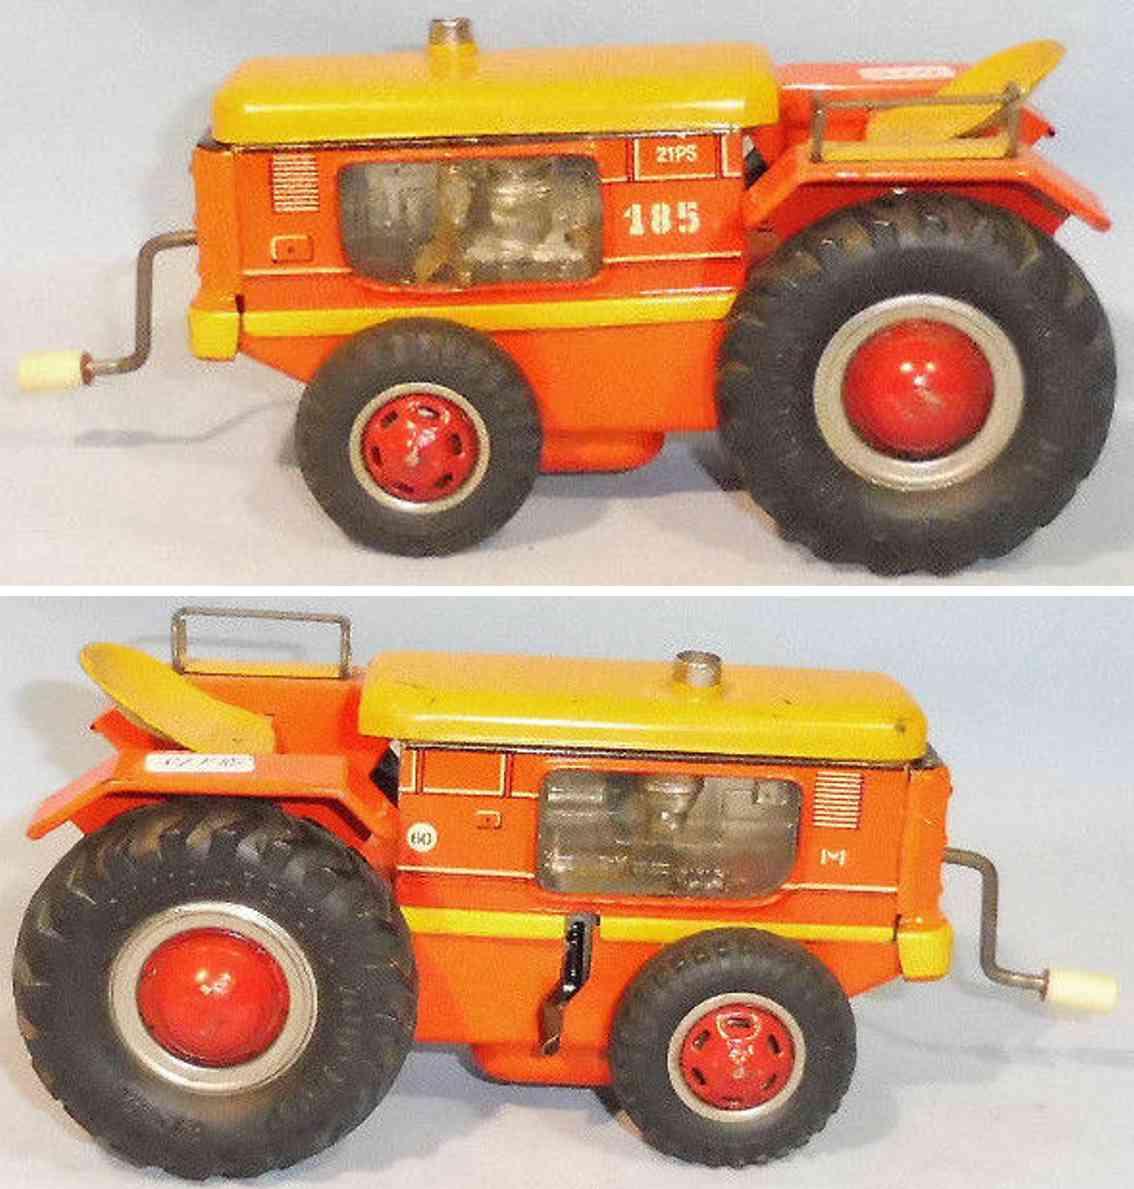 gama 185 blech spielzeug traktor schwungradantrieb rot gelb